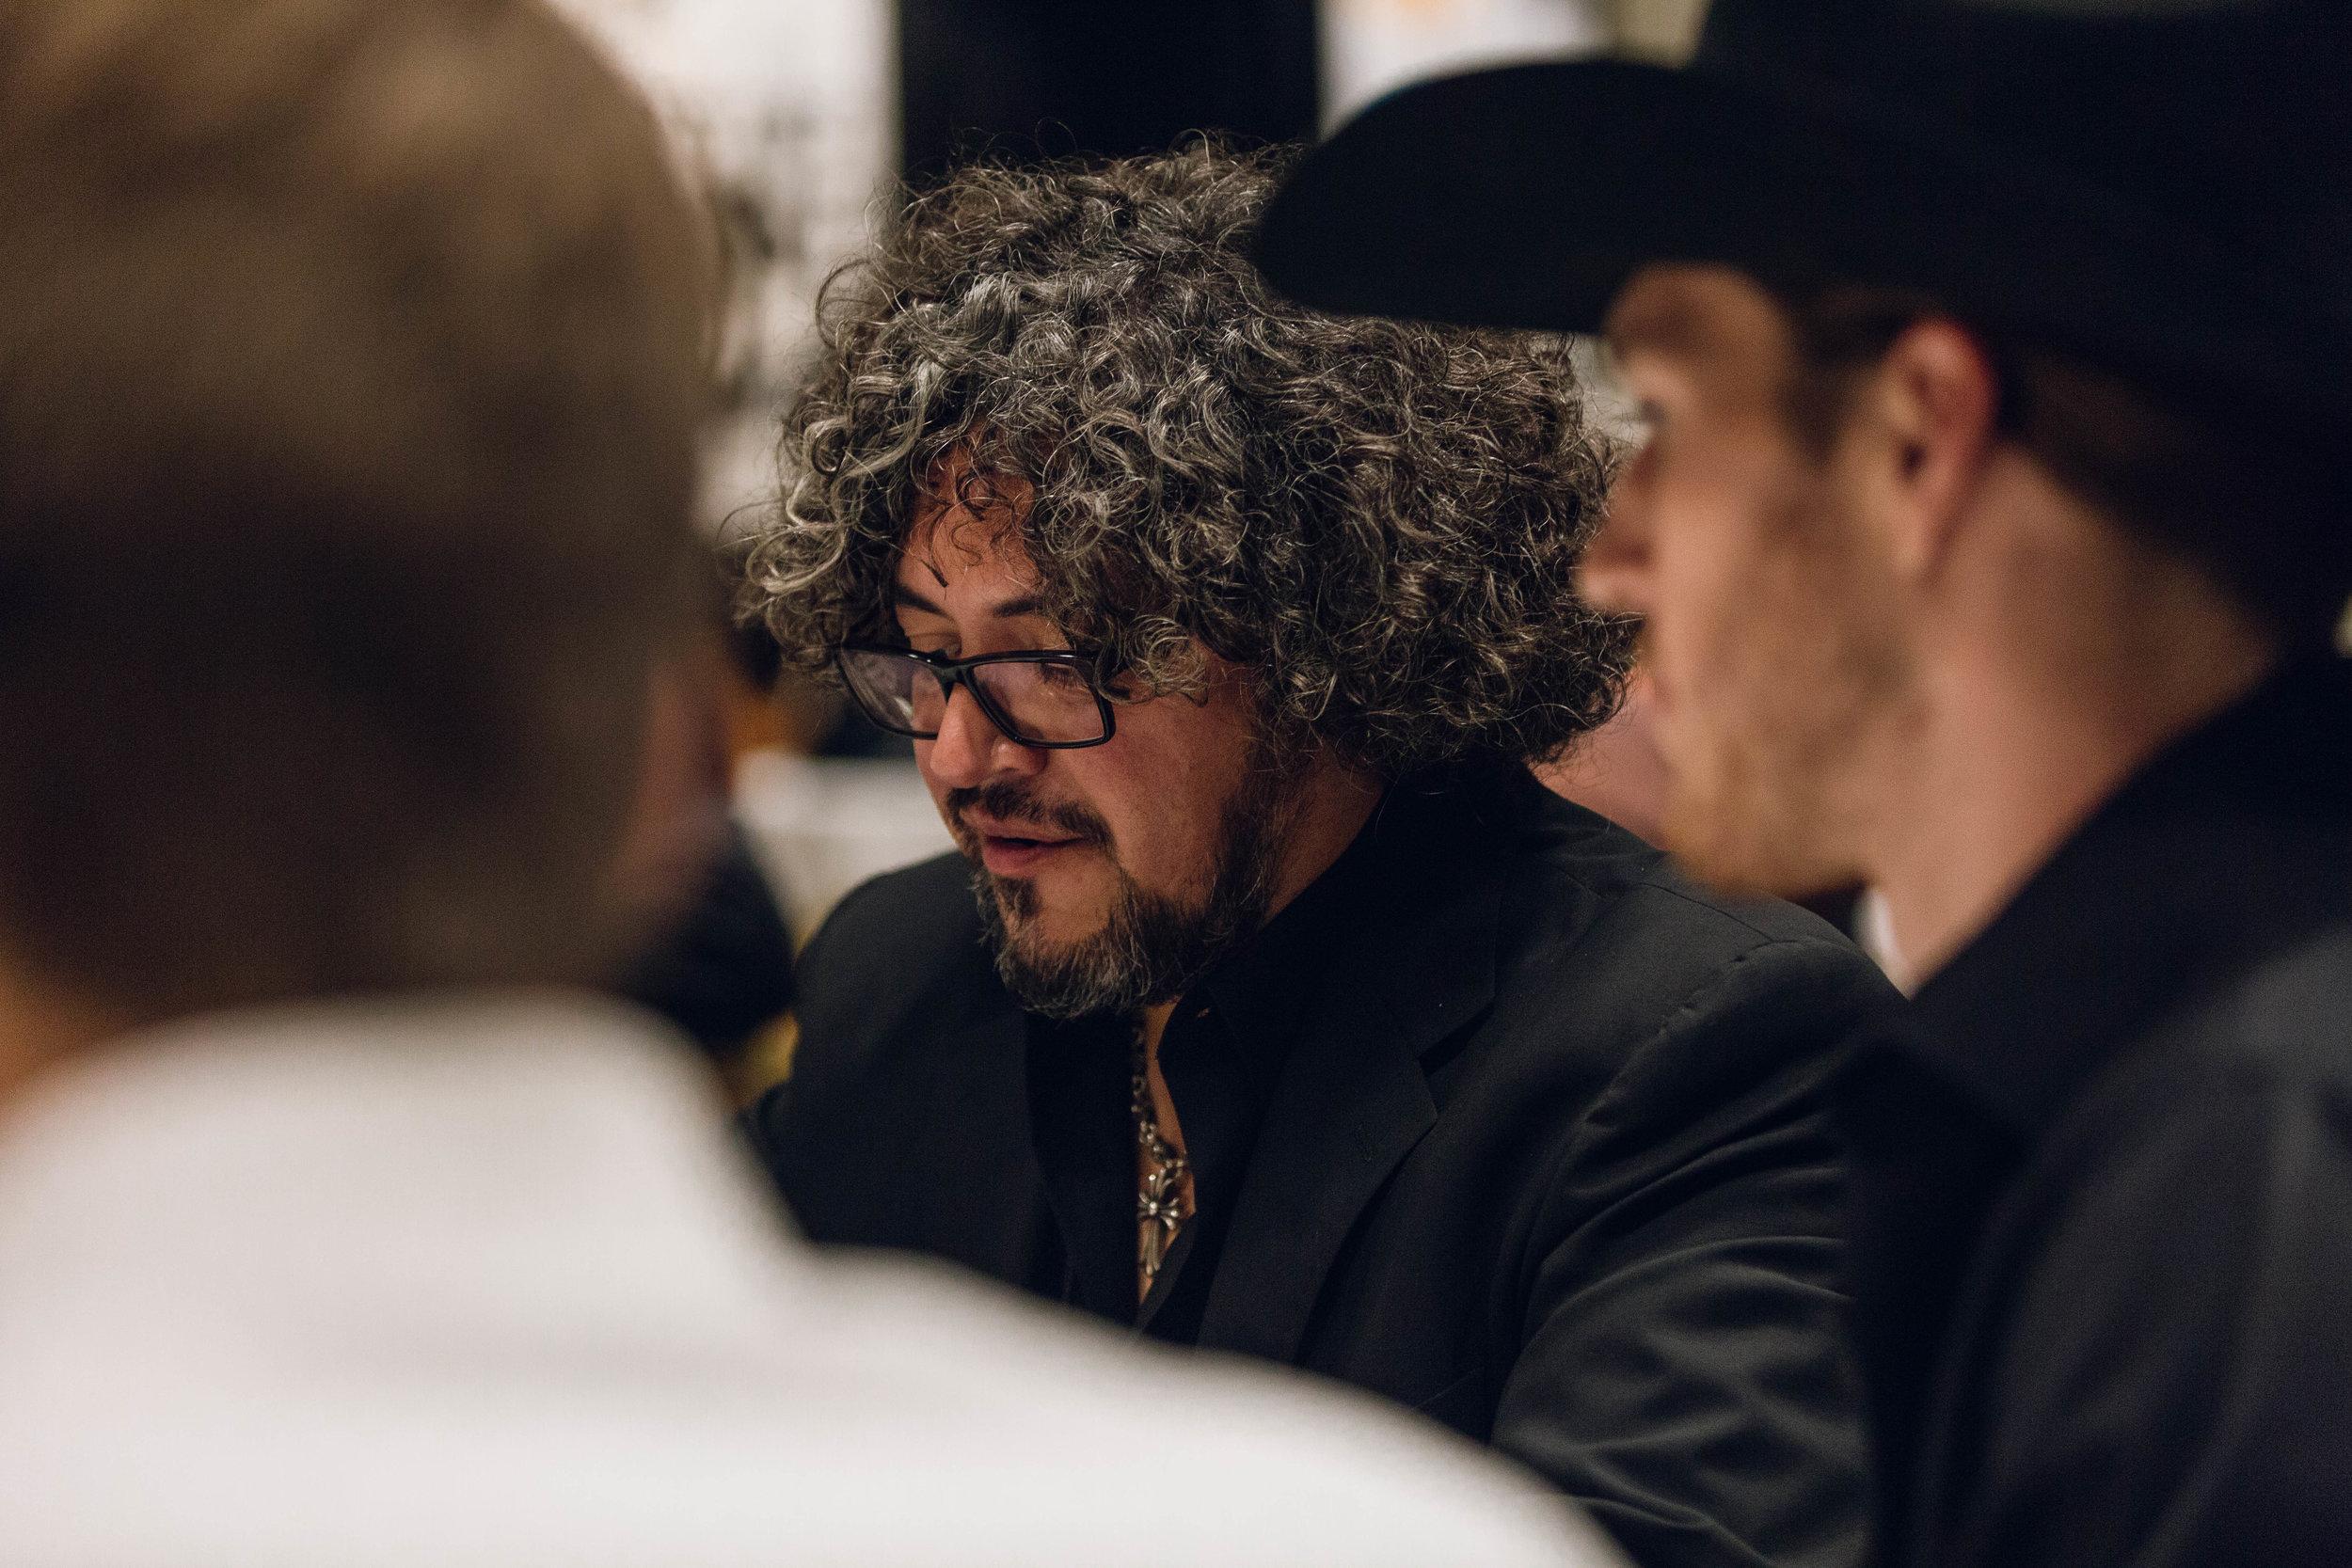 Southern-Tale-Austin-Film-Fest-Kirby-Gladstein-2017-2514.jpg